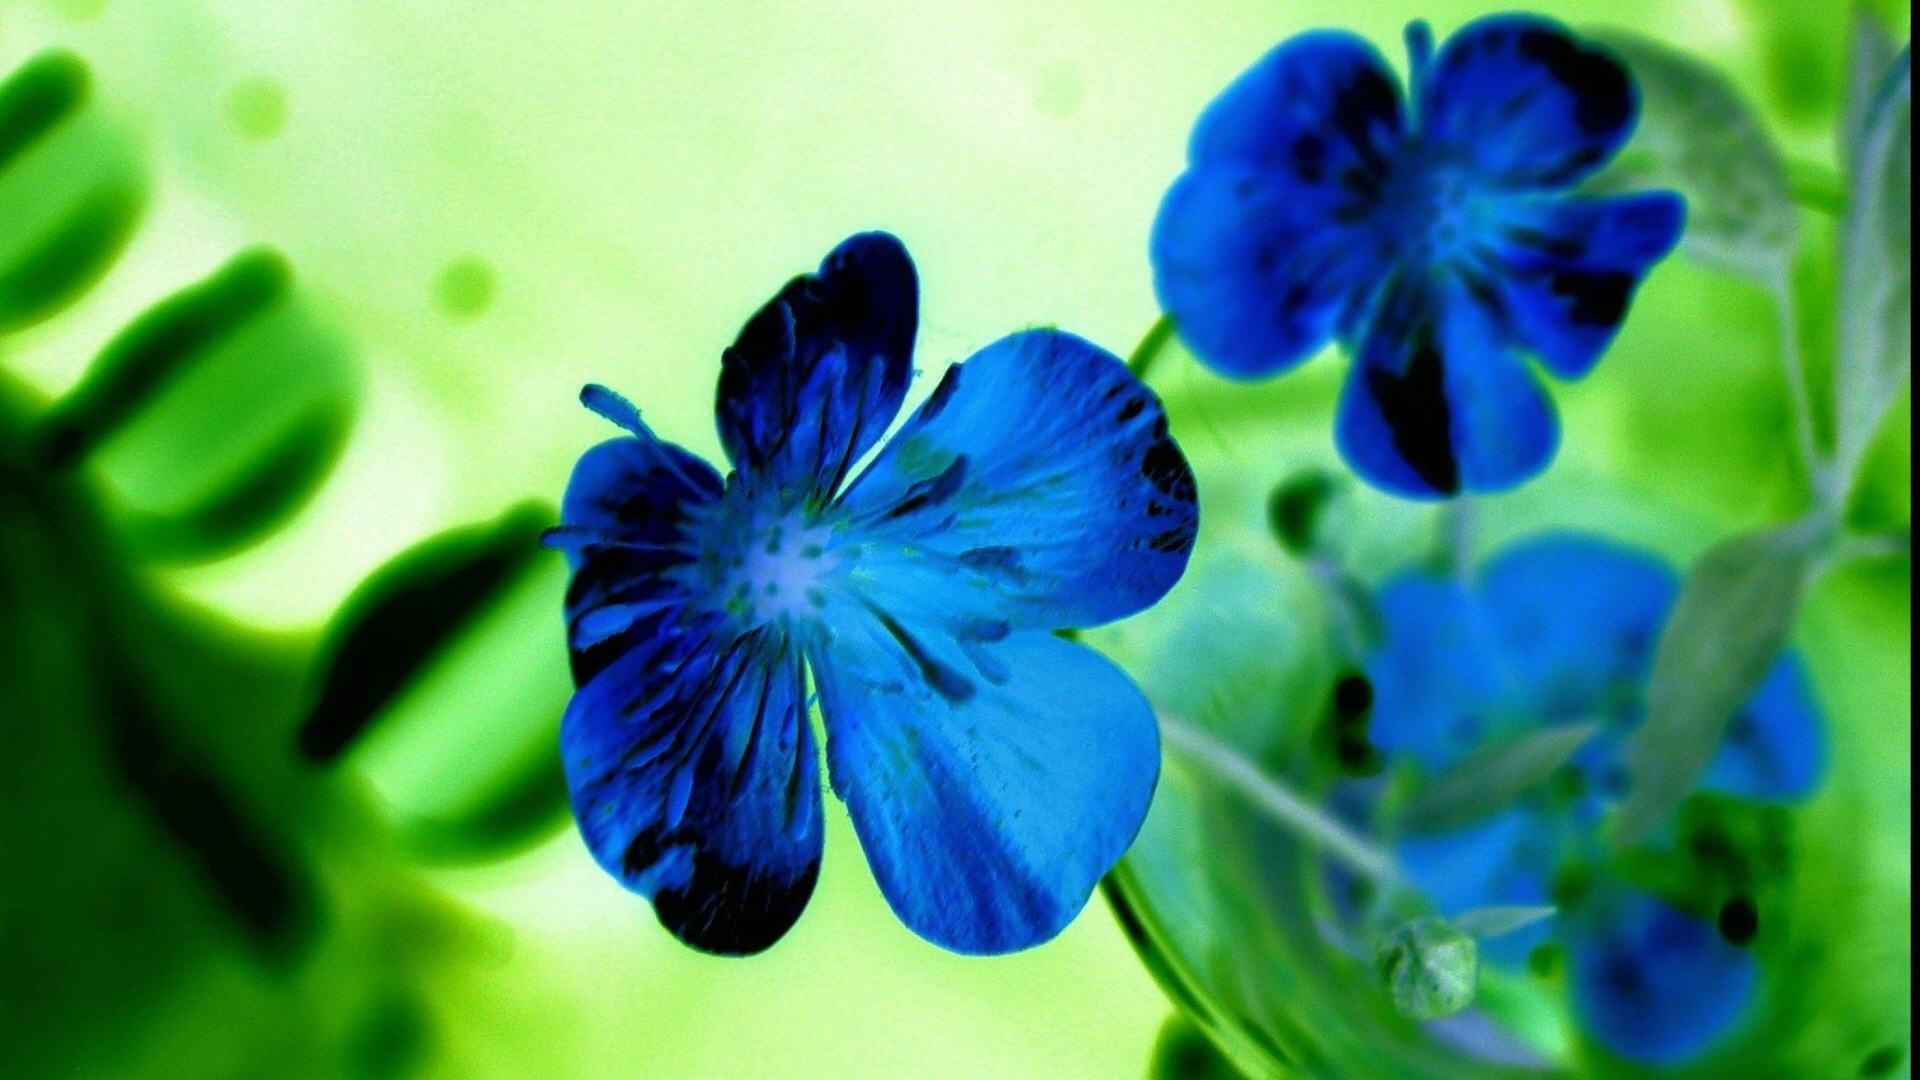 Blue Flowers Hd Wallpapers 24 High Resolution Wallpaper